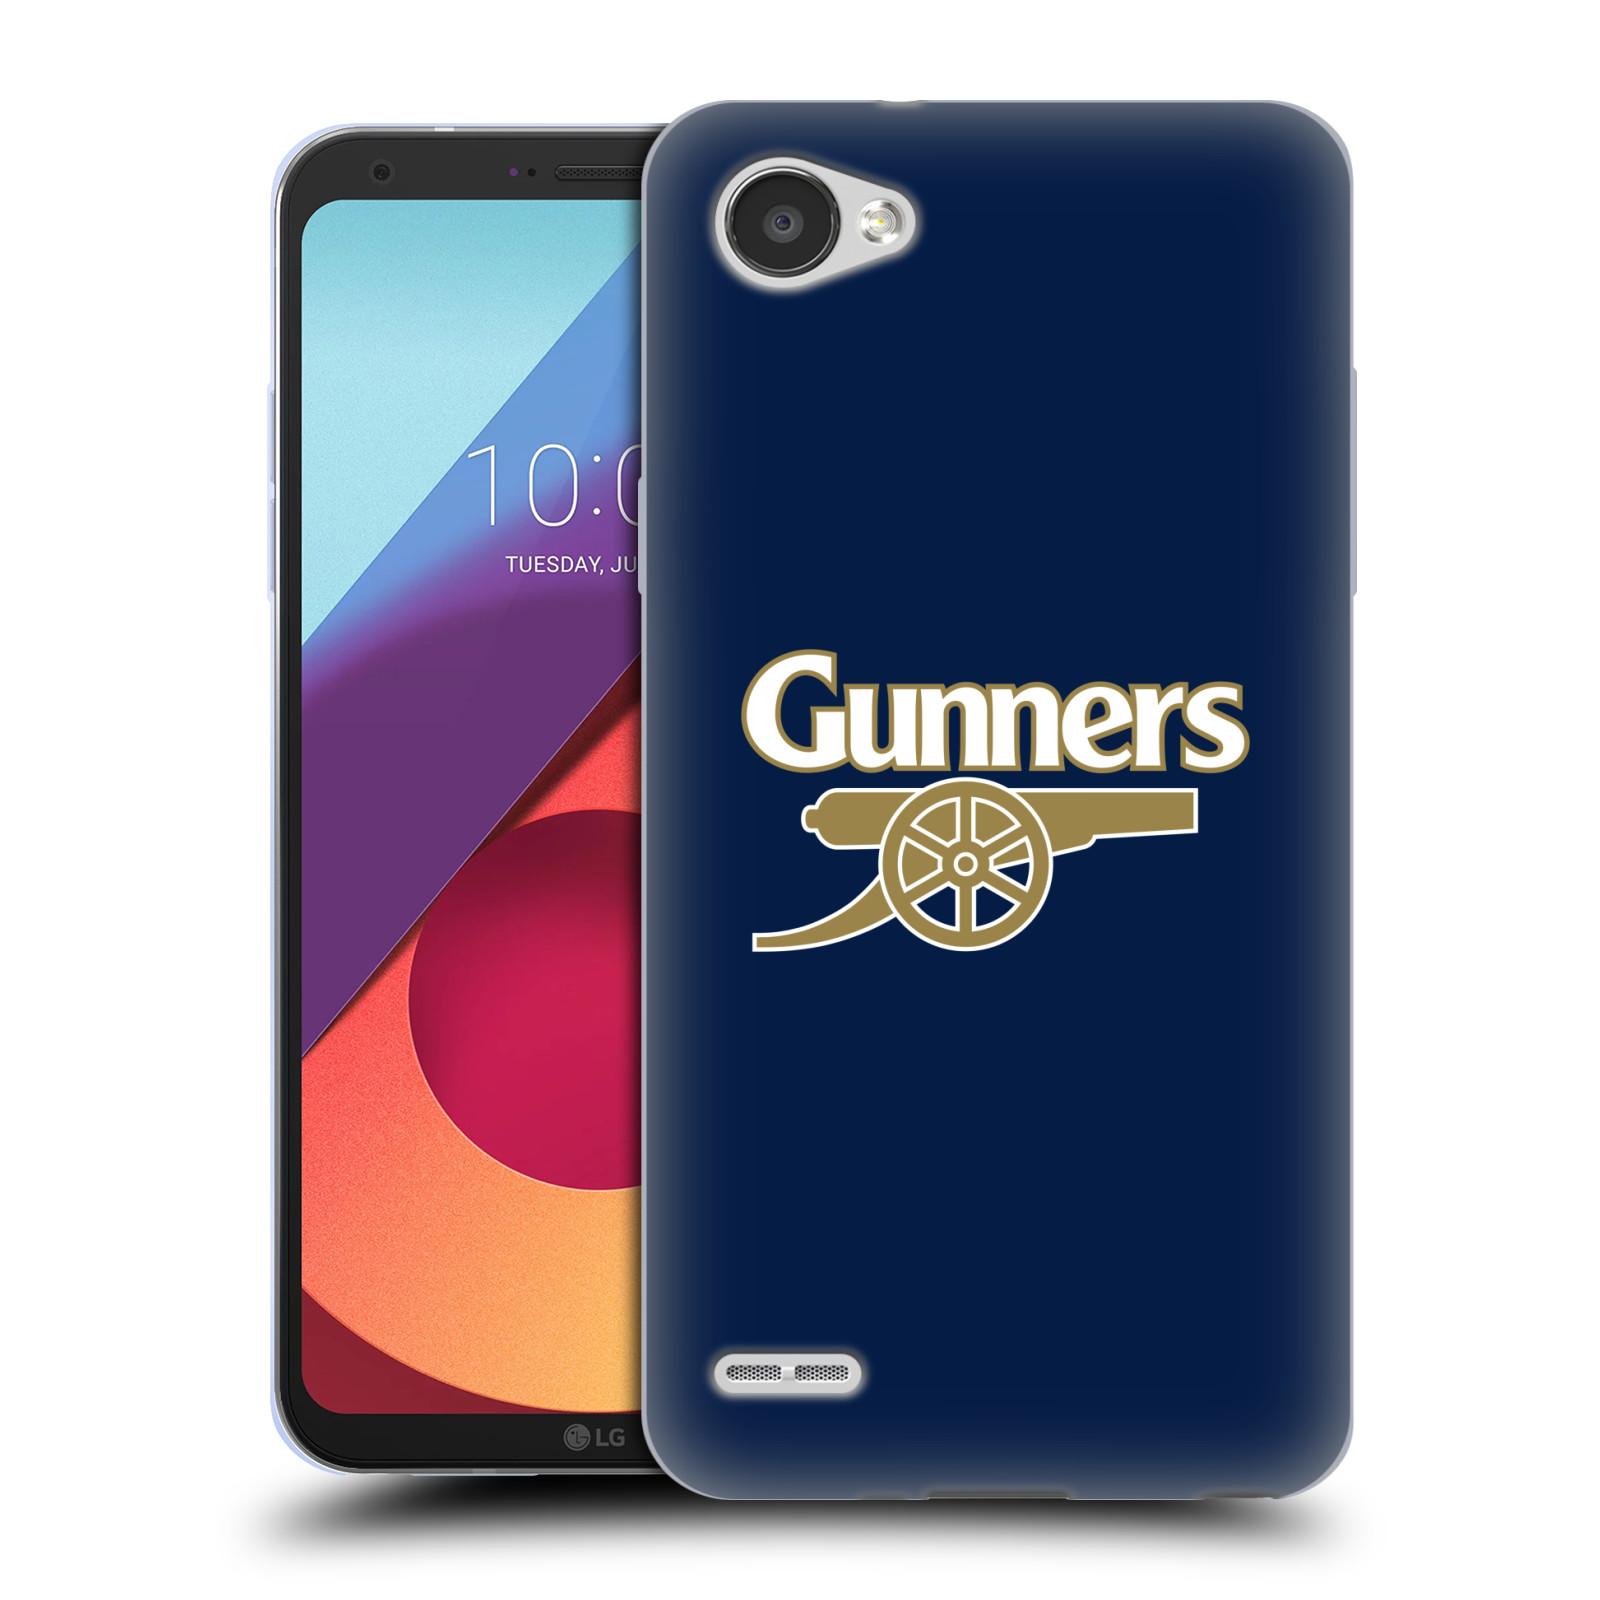 Silikonové pouzdro na mobil LG Q6 - Head Case - Arsenal FC - Gunners